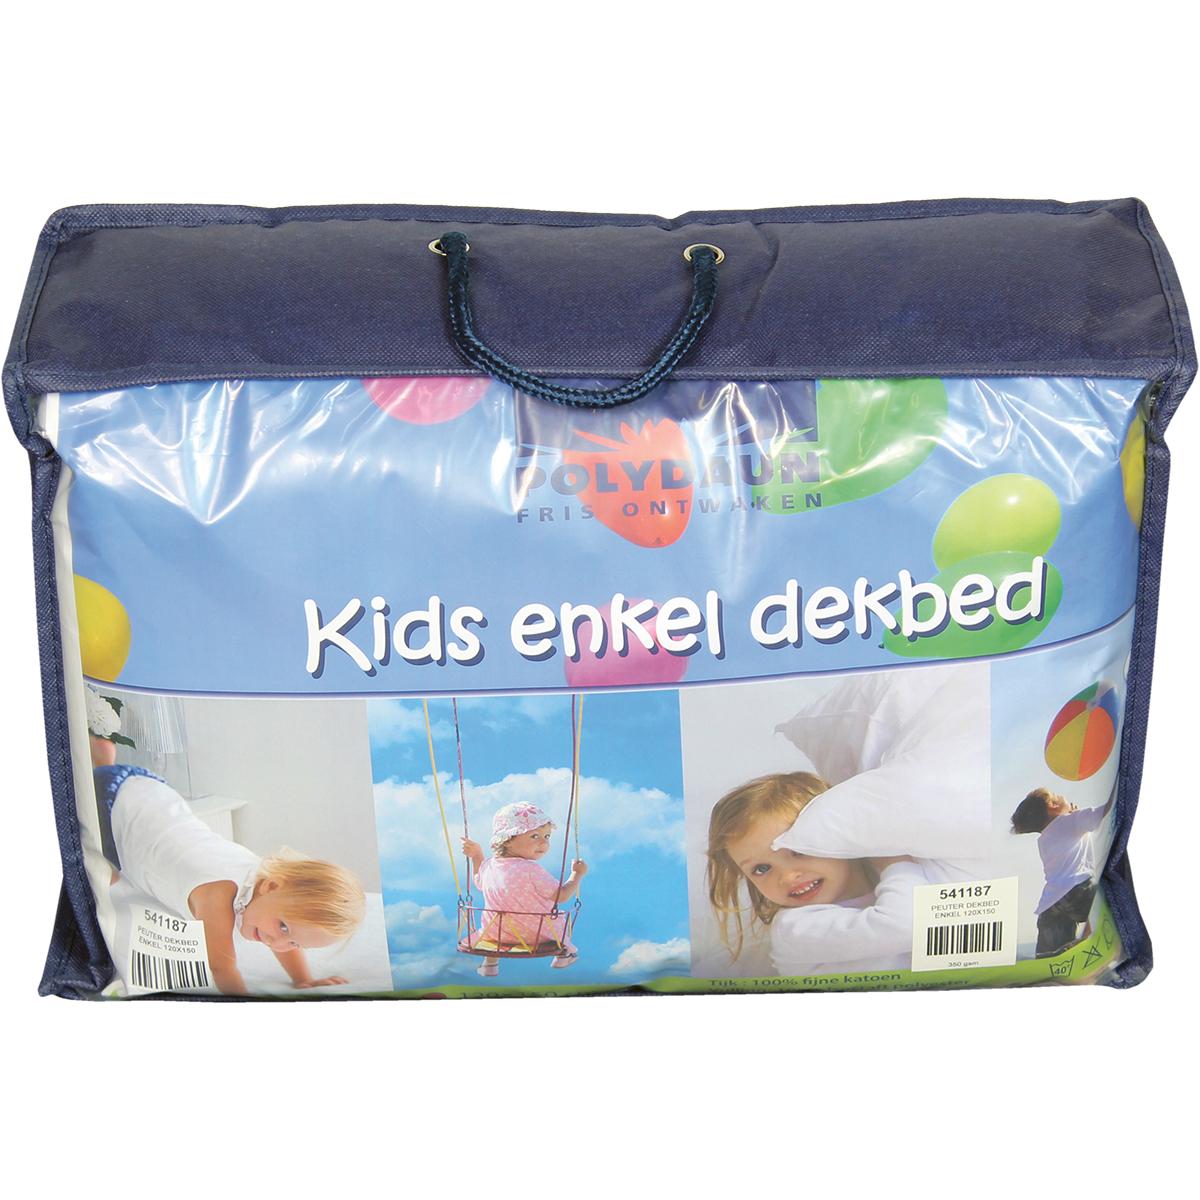 Verpakking Micky kinderdekbed